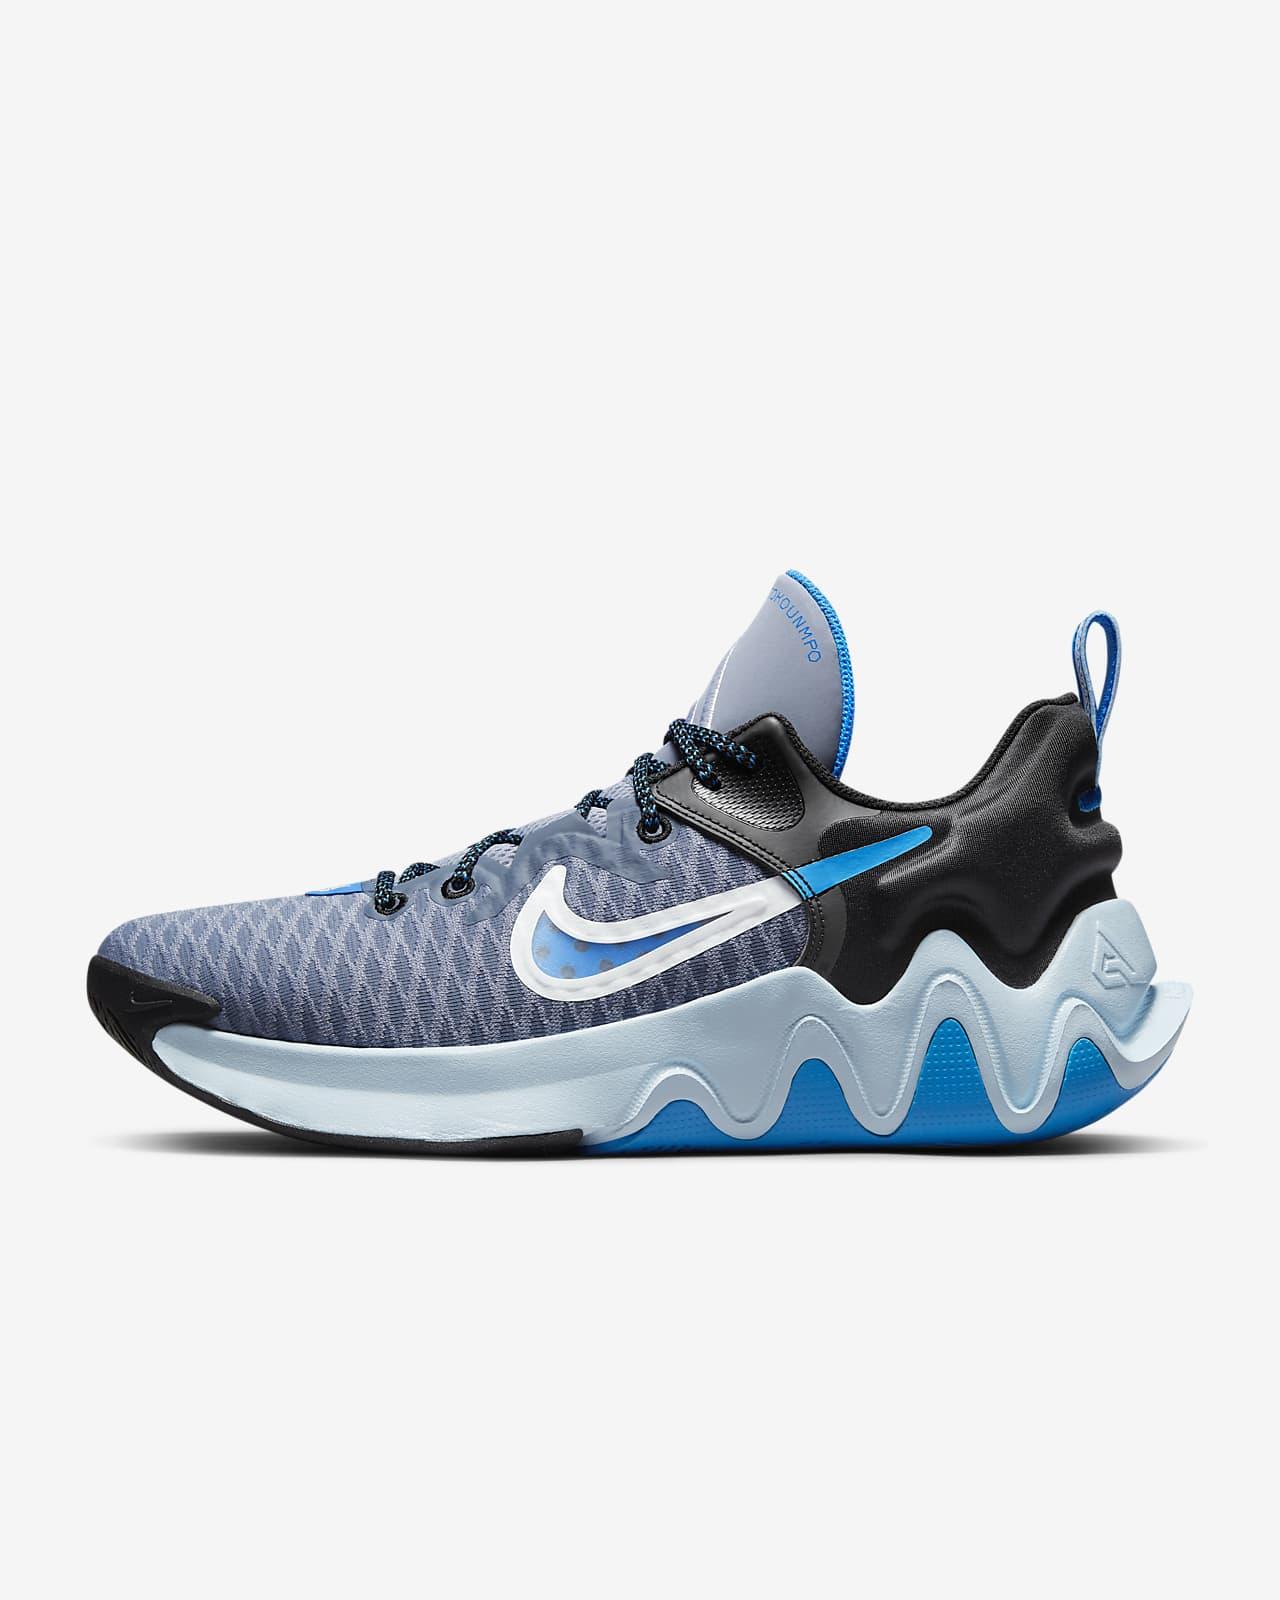 Chaussure de basketball Giannis Immortality